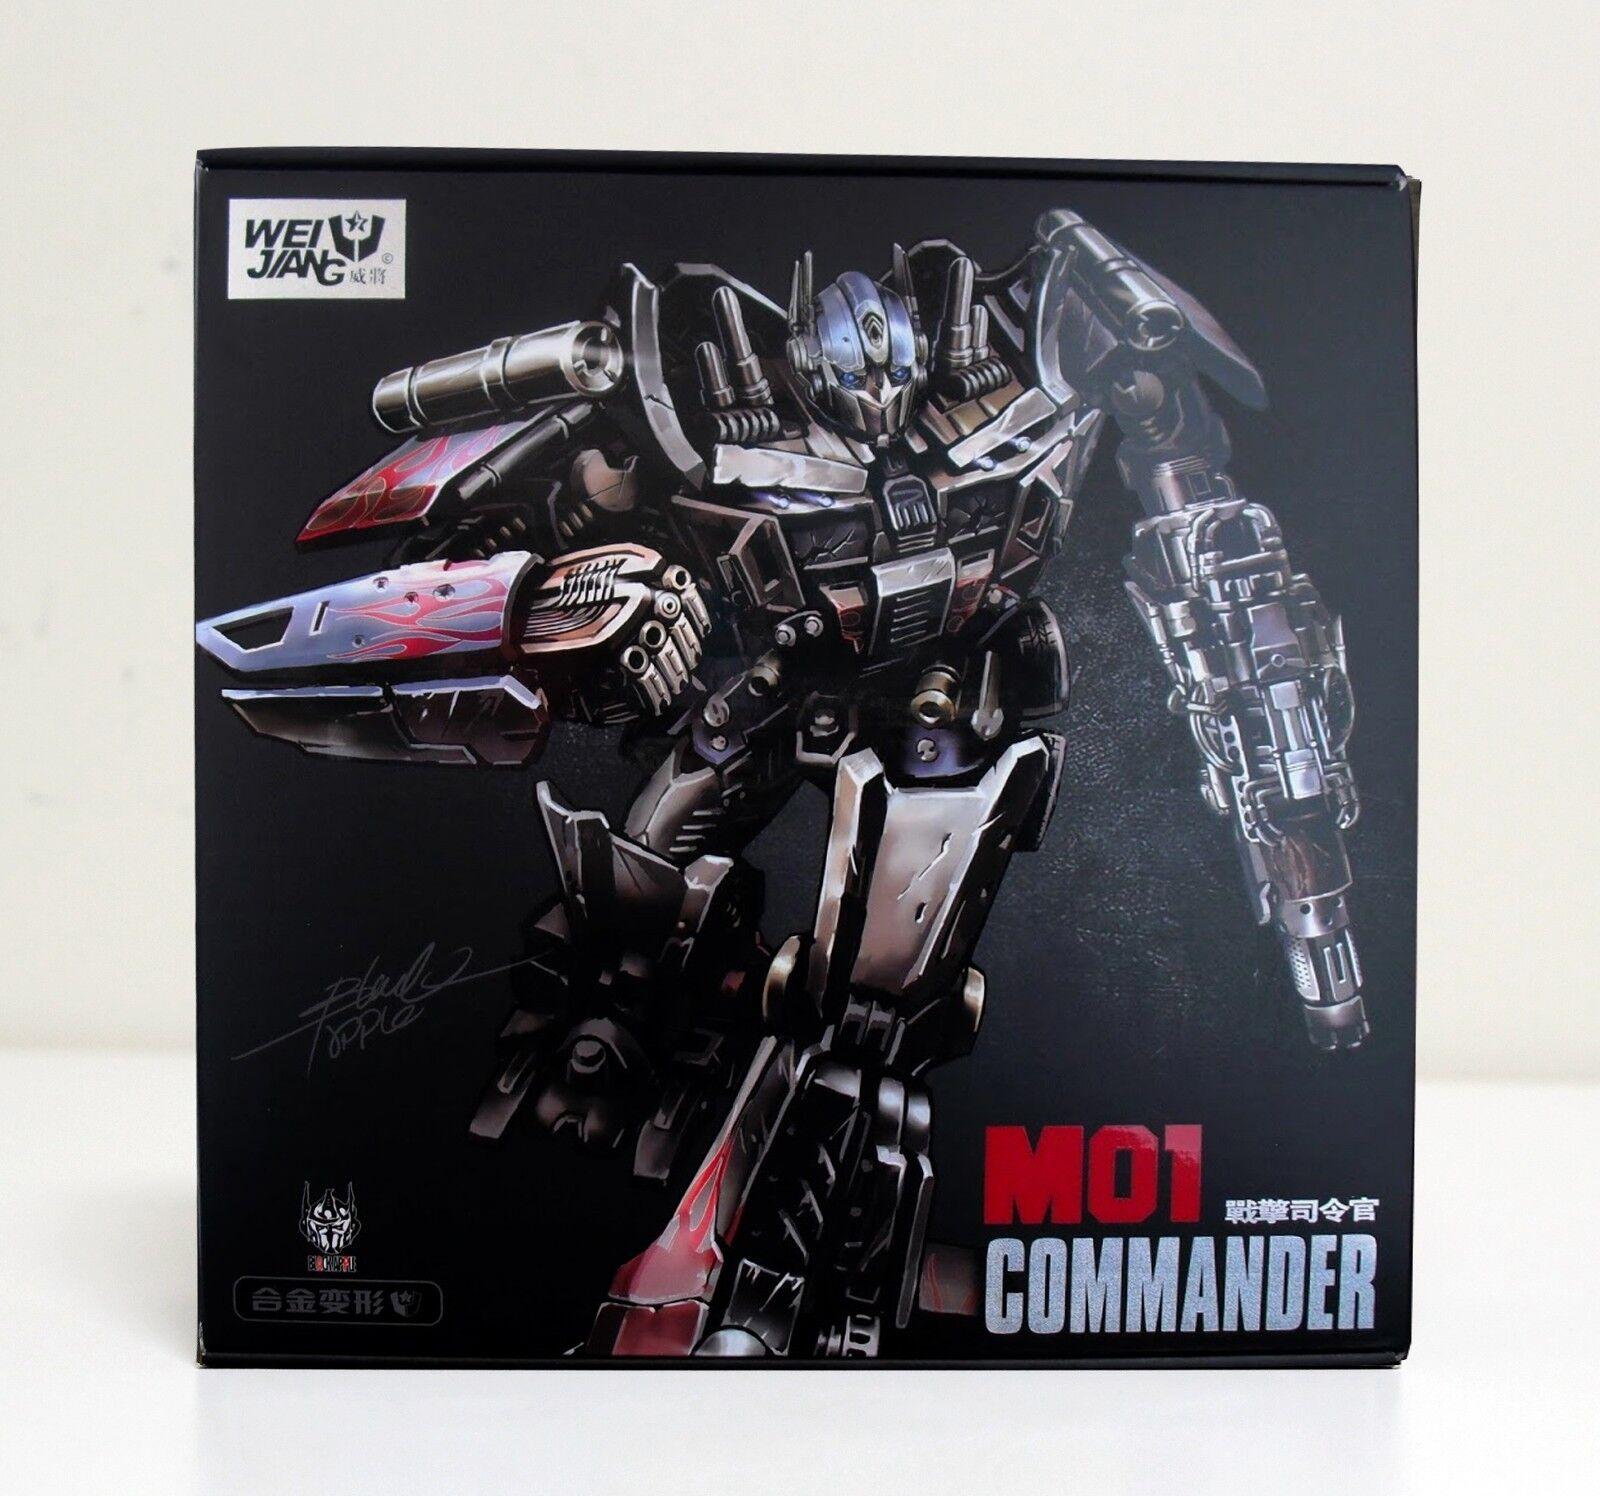 WEI JIANG WEIJIANG M01 M-01 Commander Transformers OP NEW